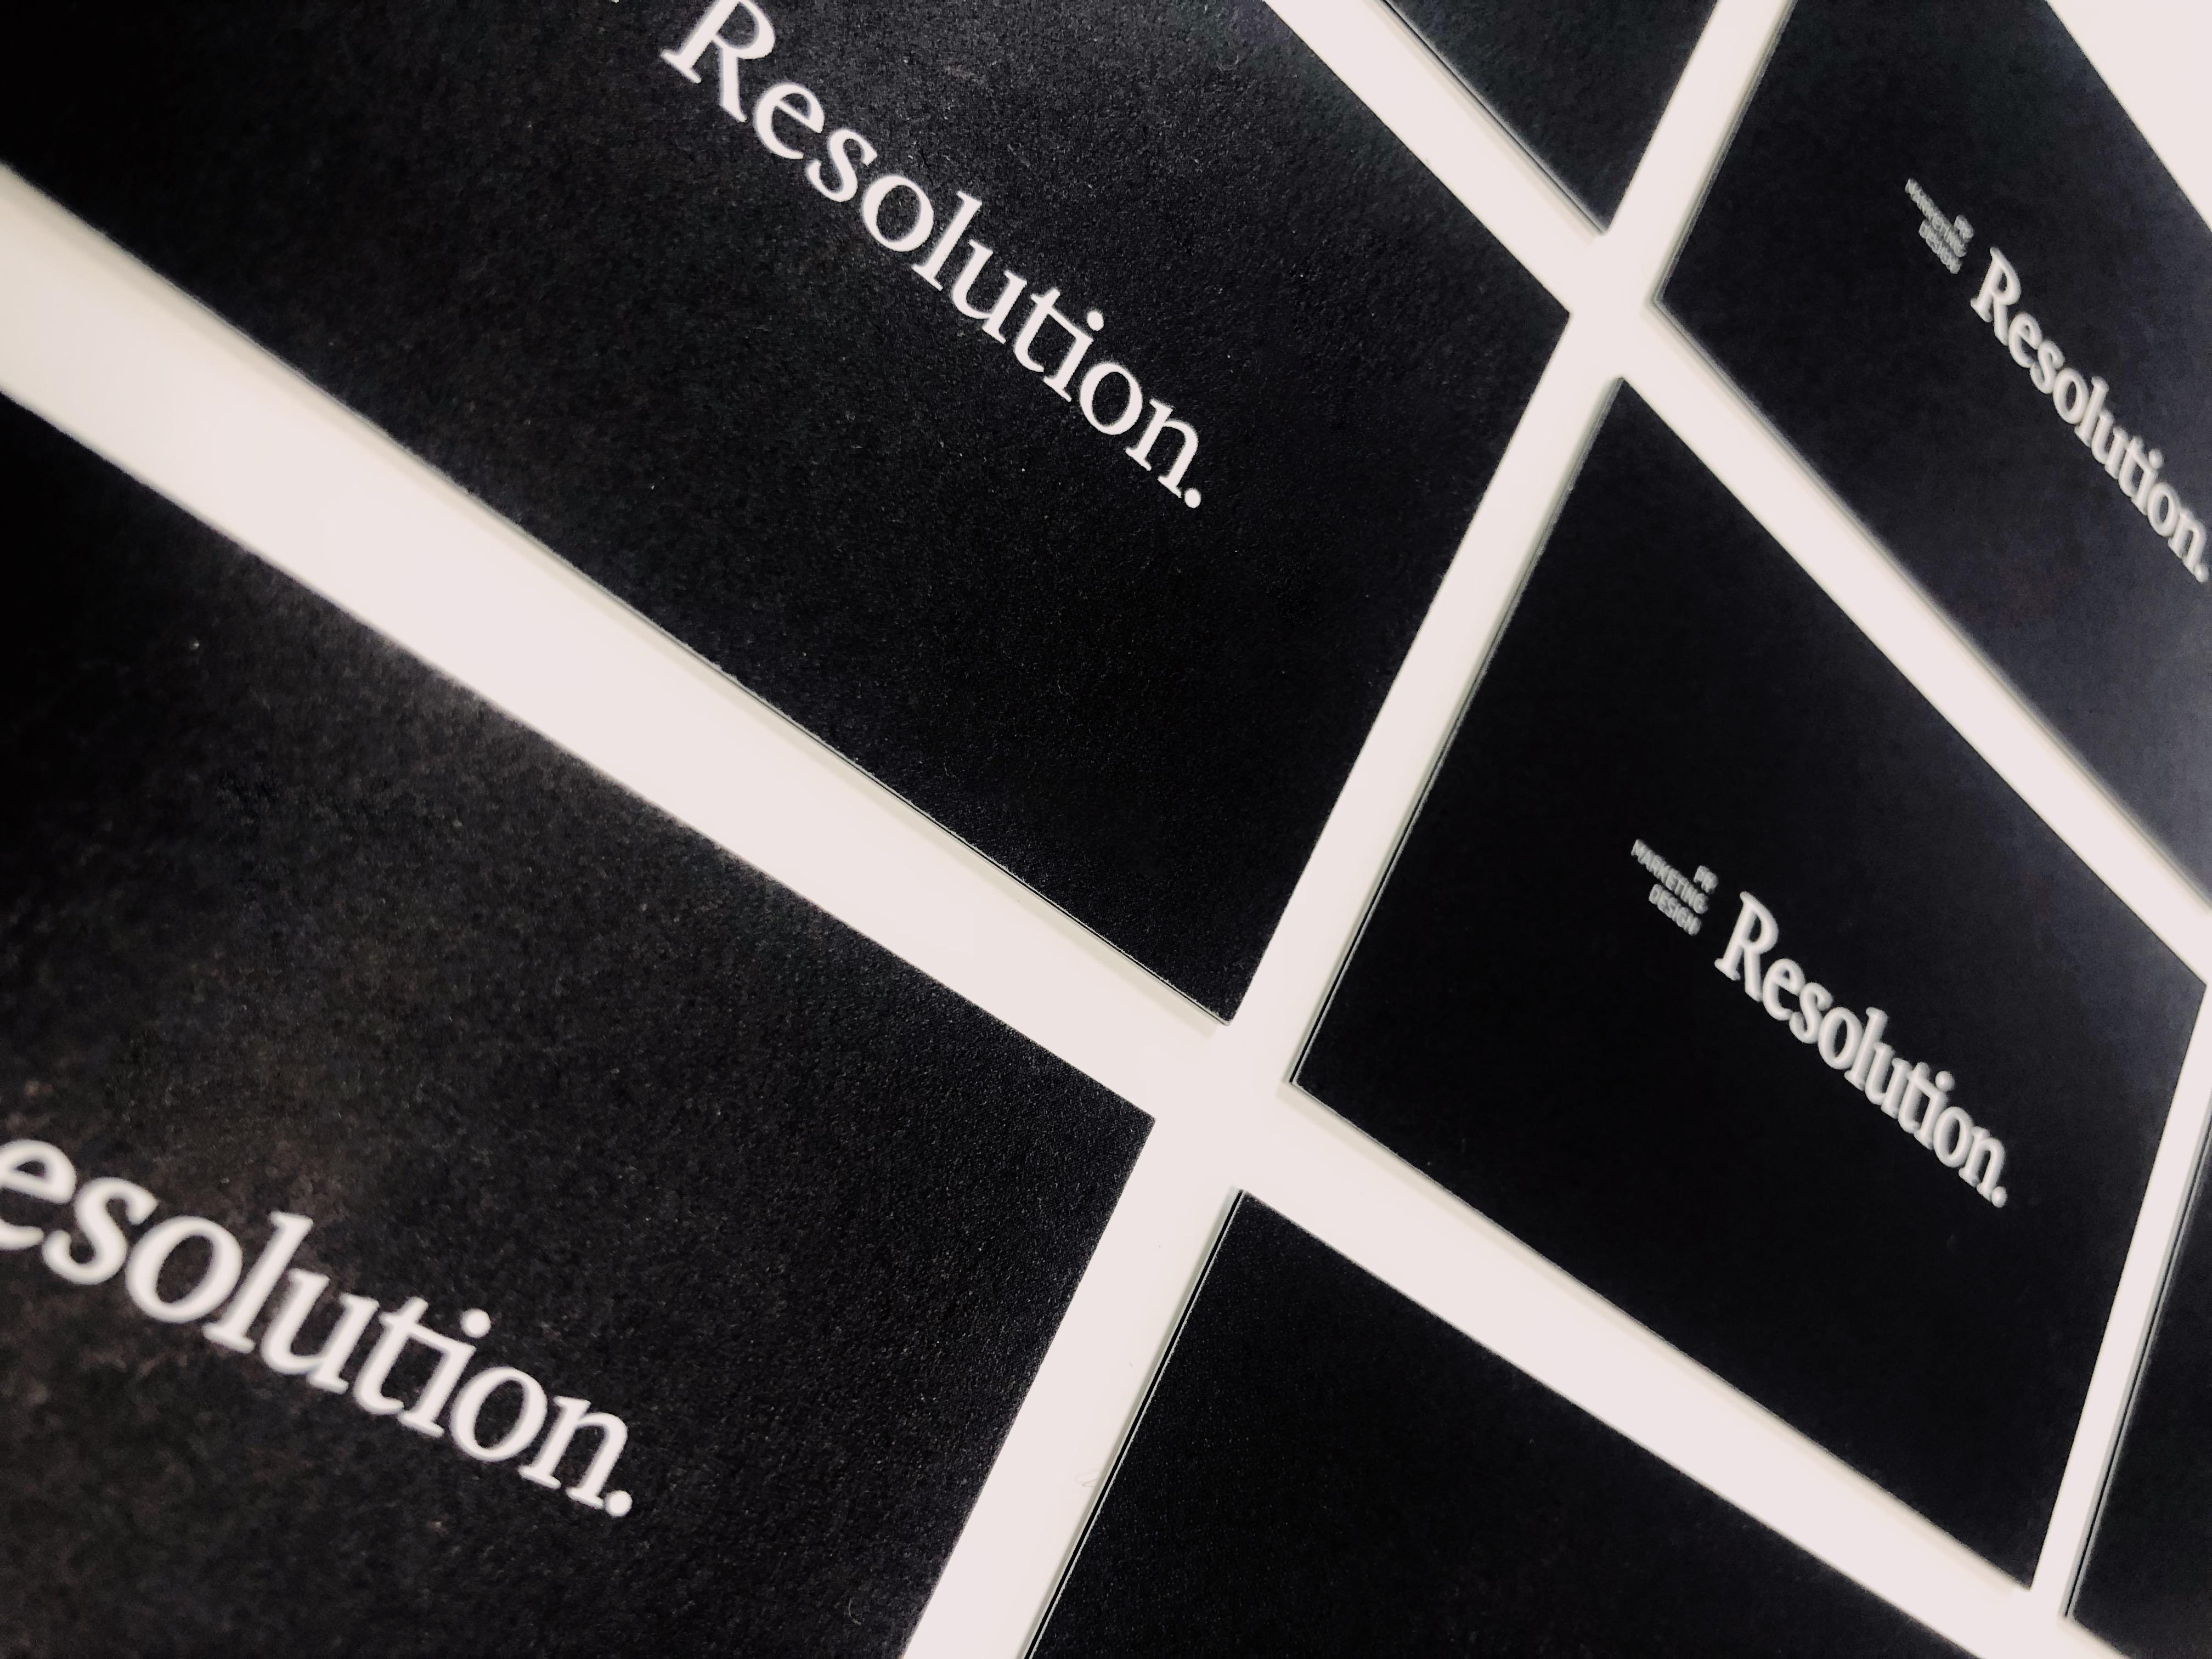 Resolution sees immediate rewards following recent rebrand